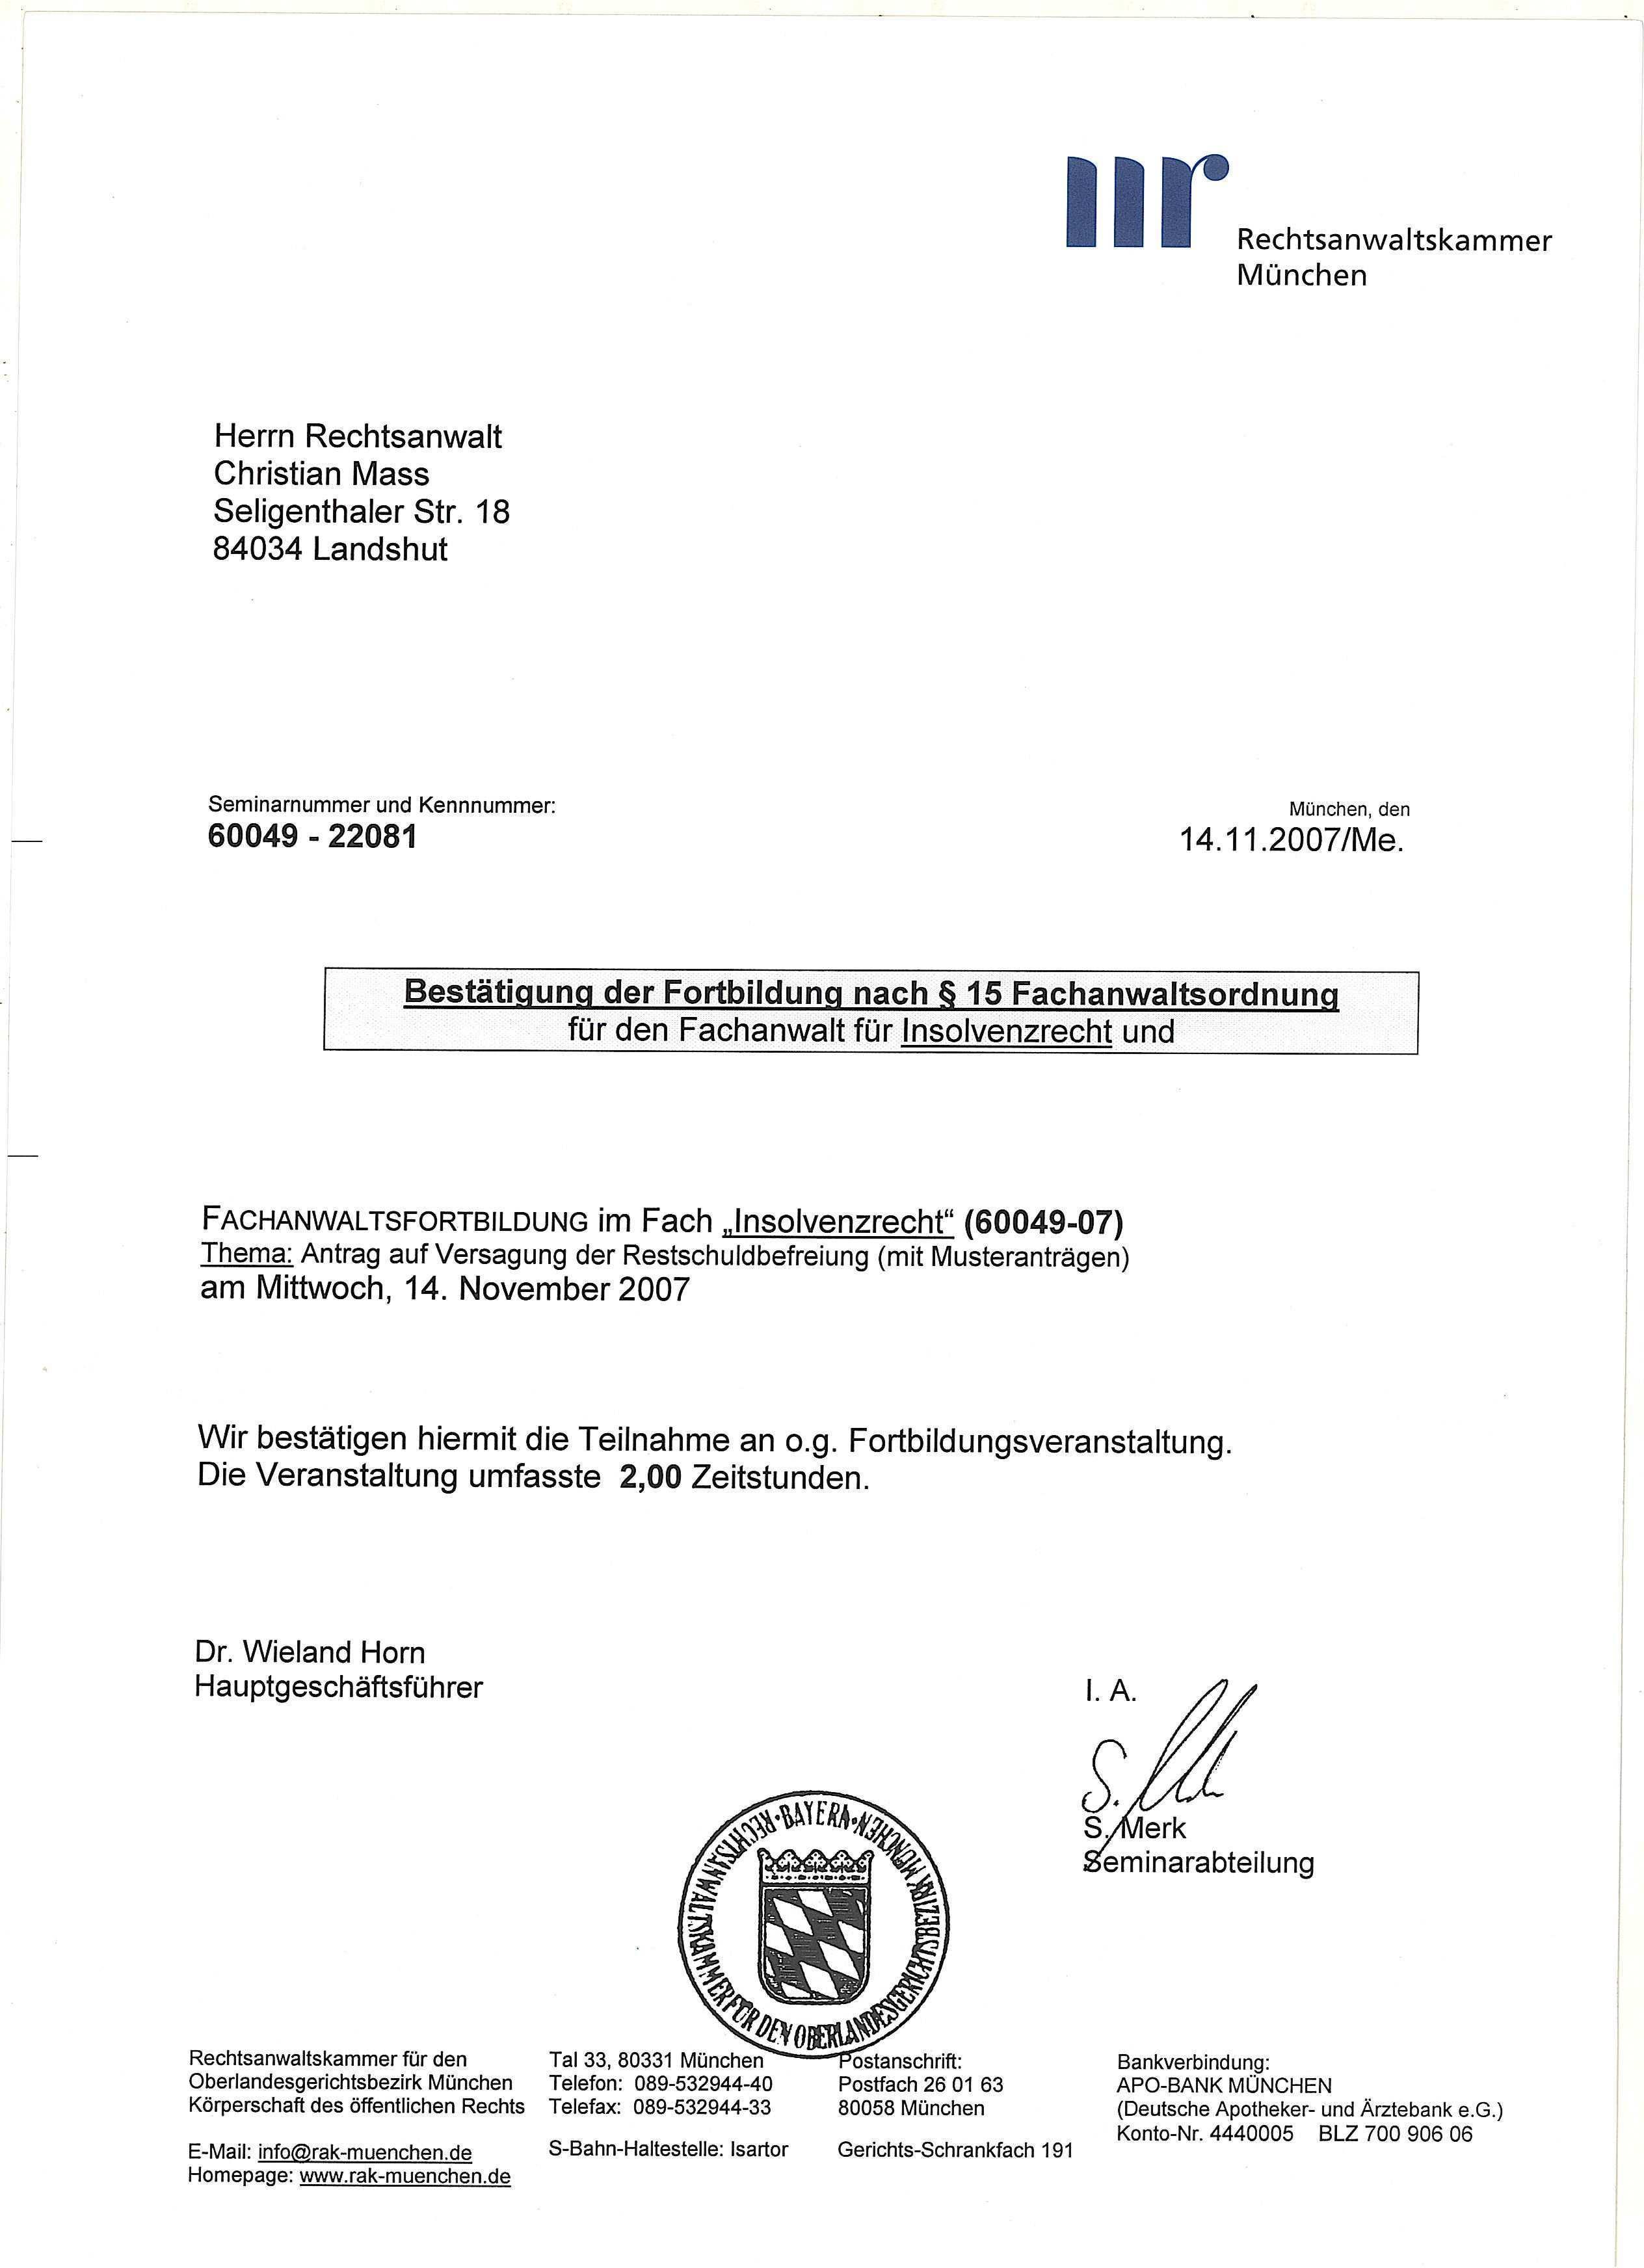 Rechtsanwaltskanzlei Mass 2007 Rechtsanwaltskanzlei Mass In Landshut Hilft Im Arbeitsrecht Insolvenzrecht Mietrecht Vertragsrecht Urheberrecht Schadensersatzrecht Weitere Infos